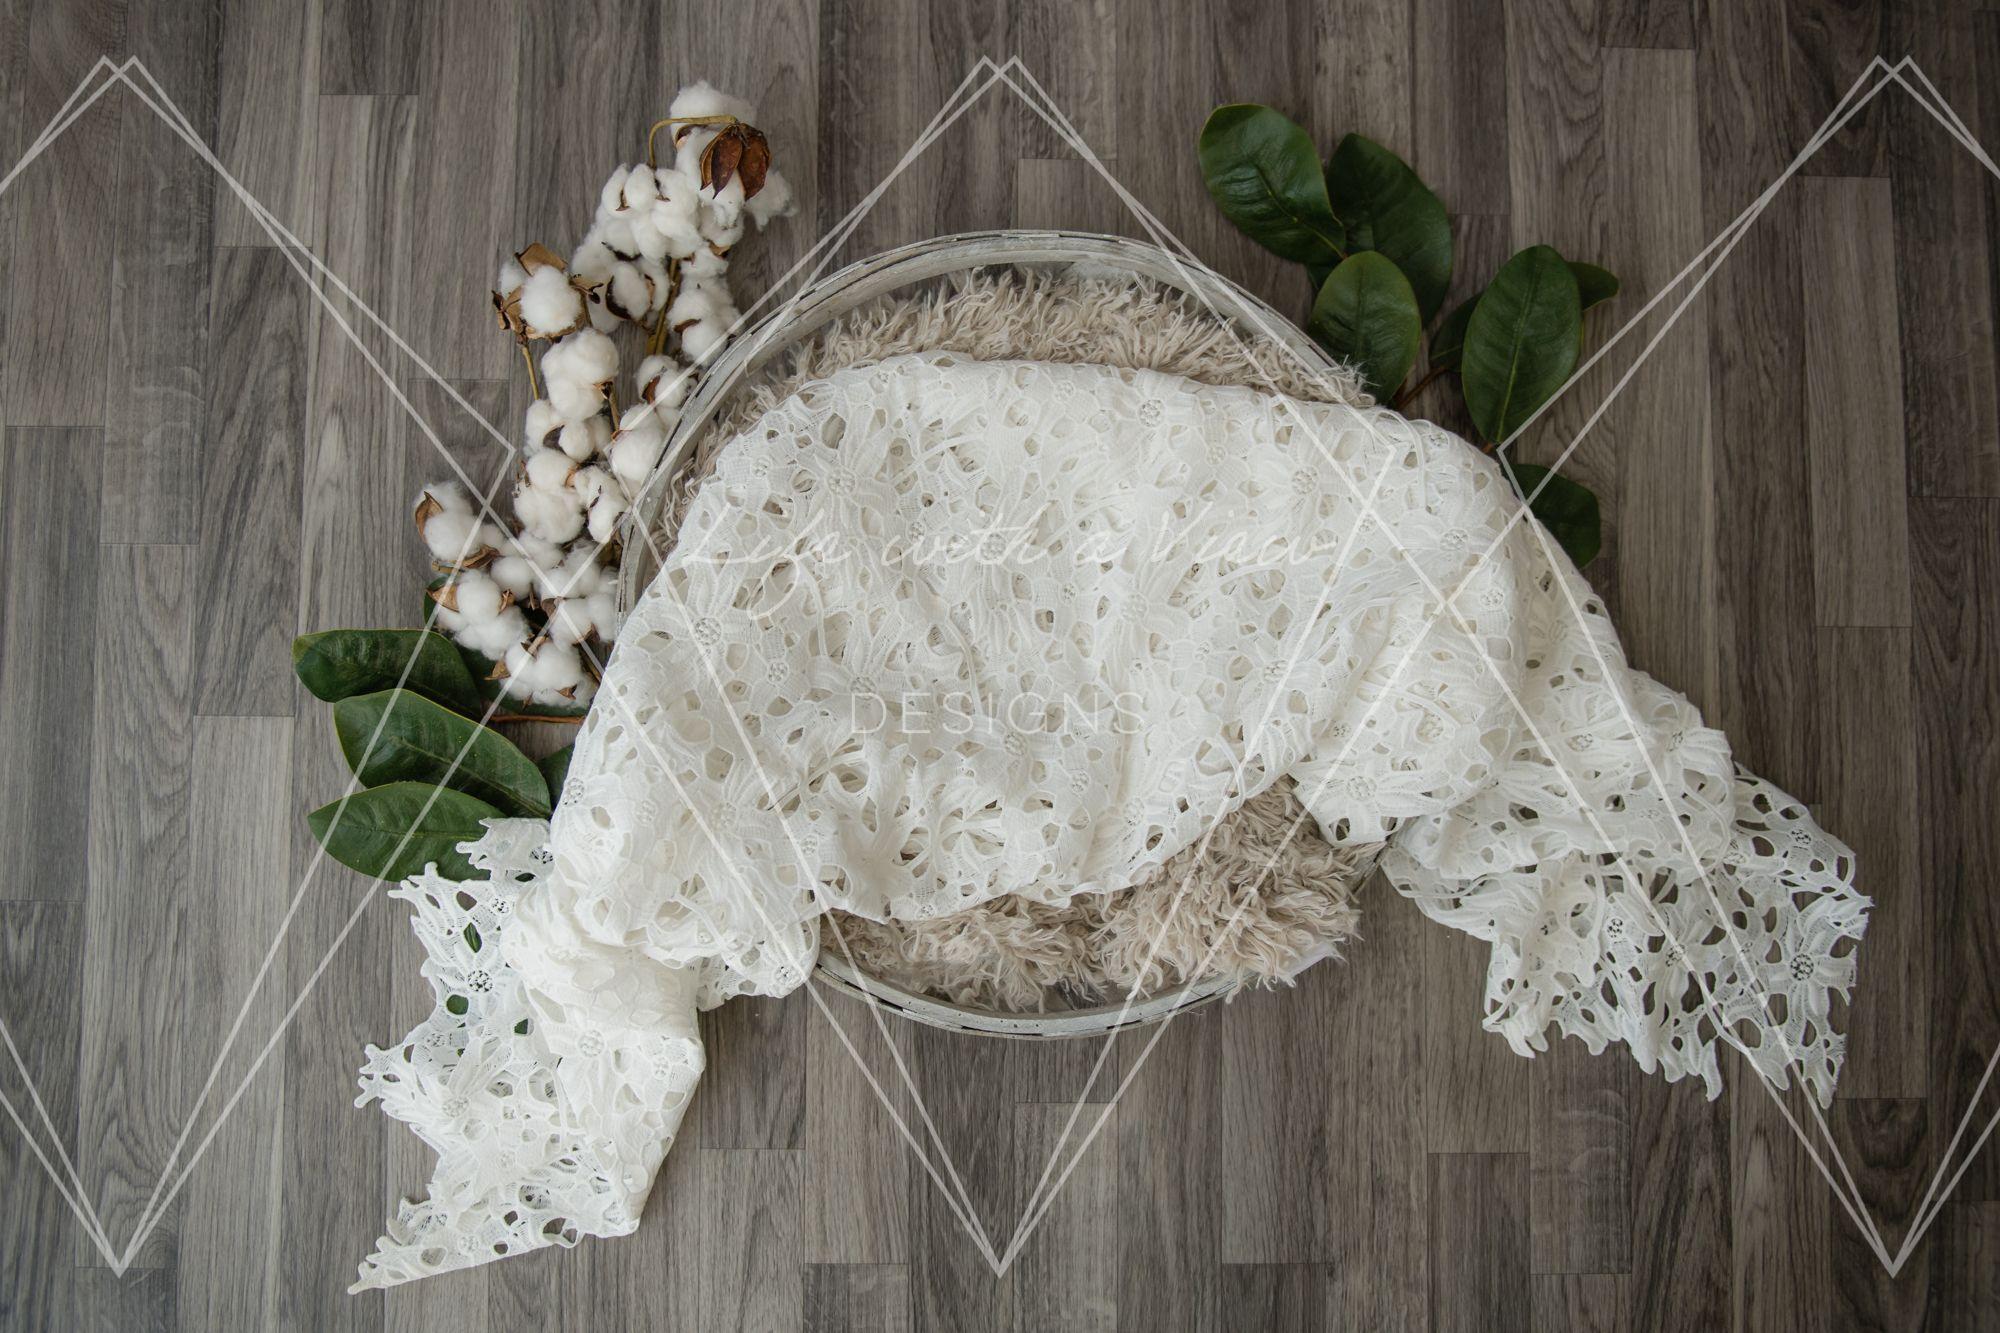 Cotton, Lace, Farmhouse Inspired Newborn Digital Backdrop, Digital Newborn Background